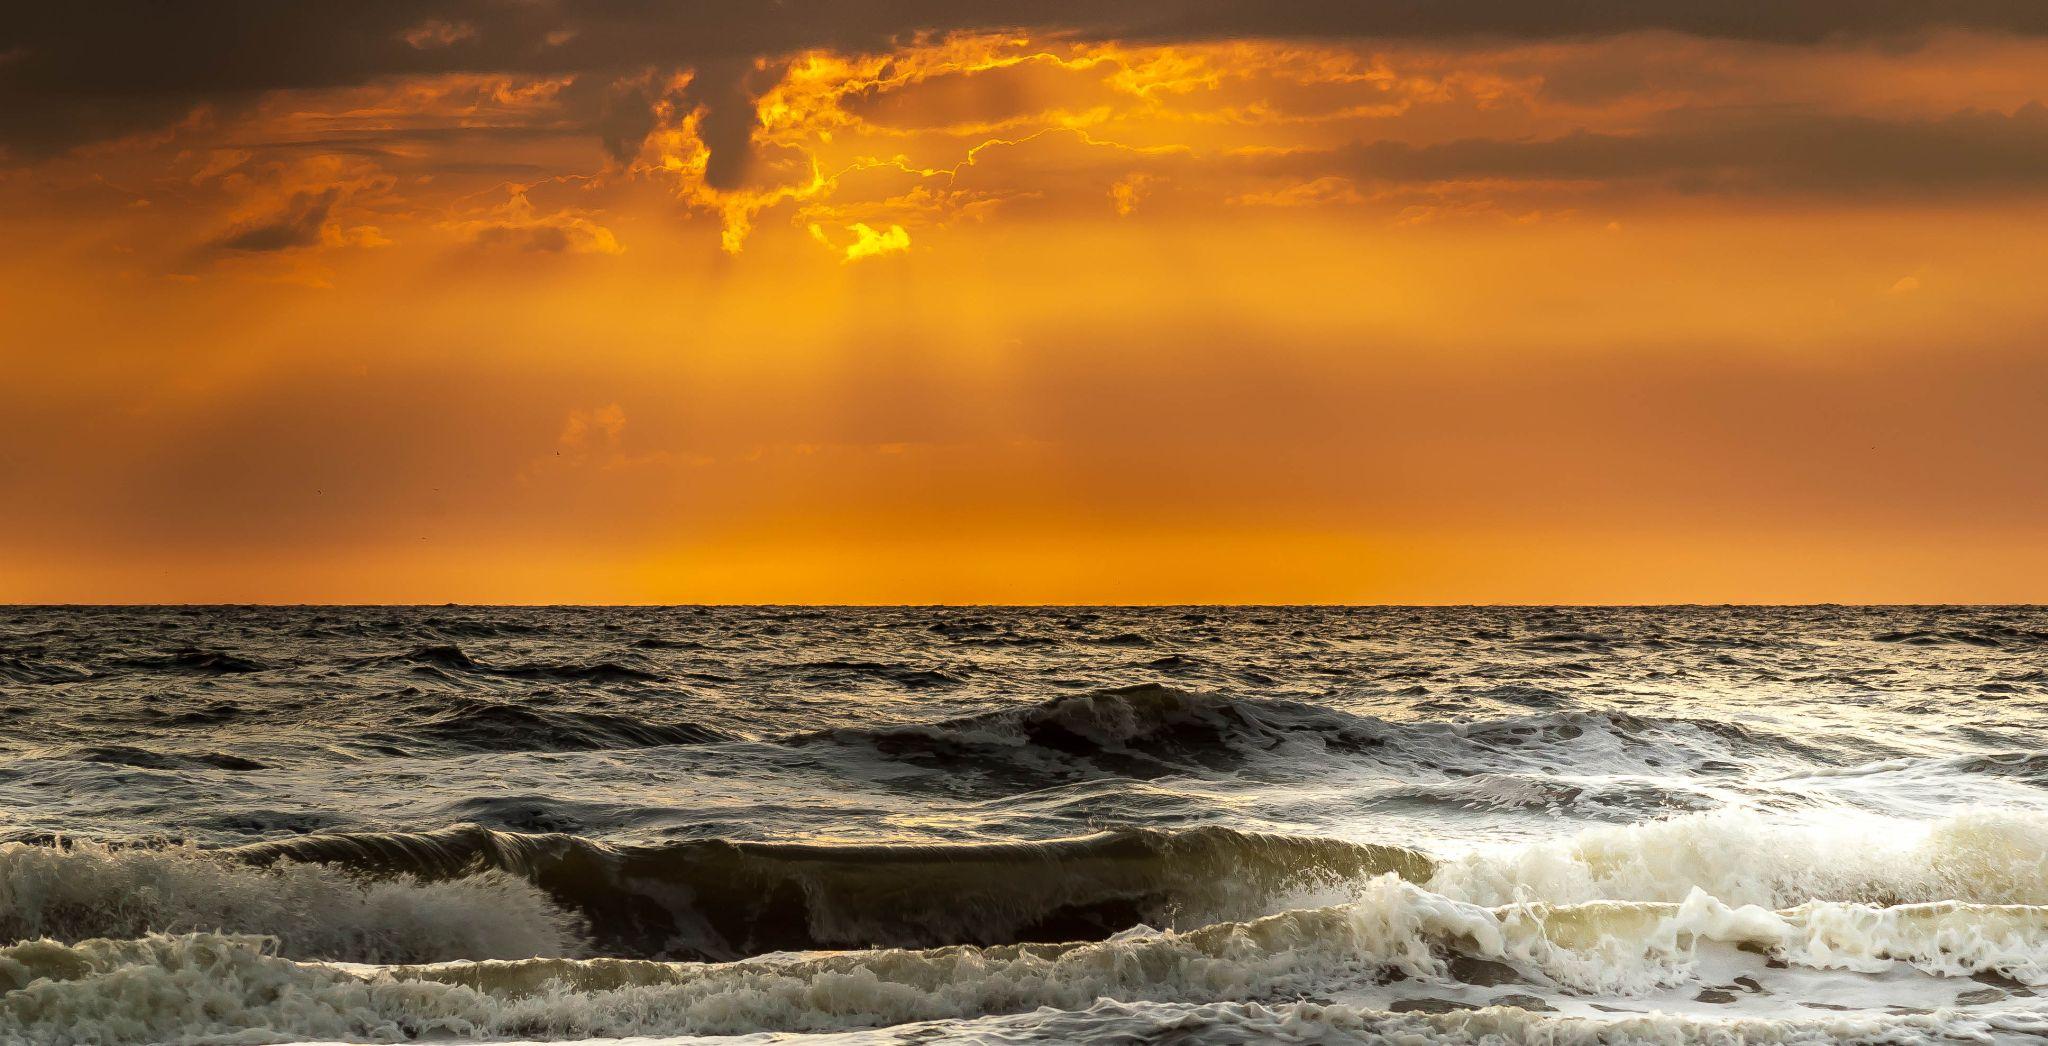 sunset over sea  by norbert.stojke